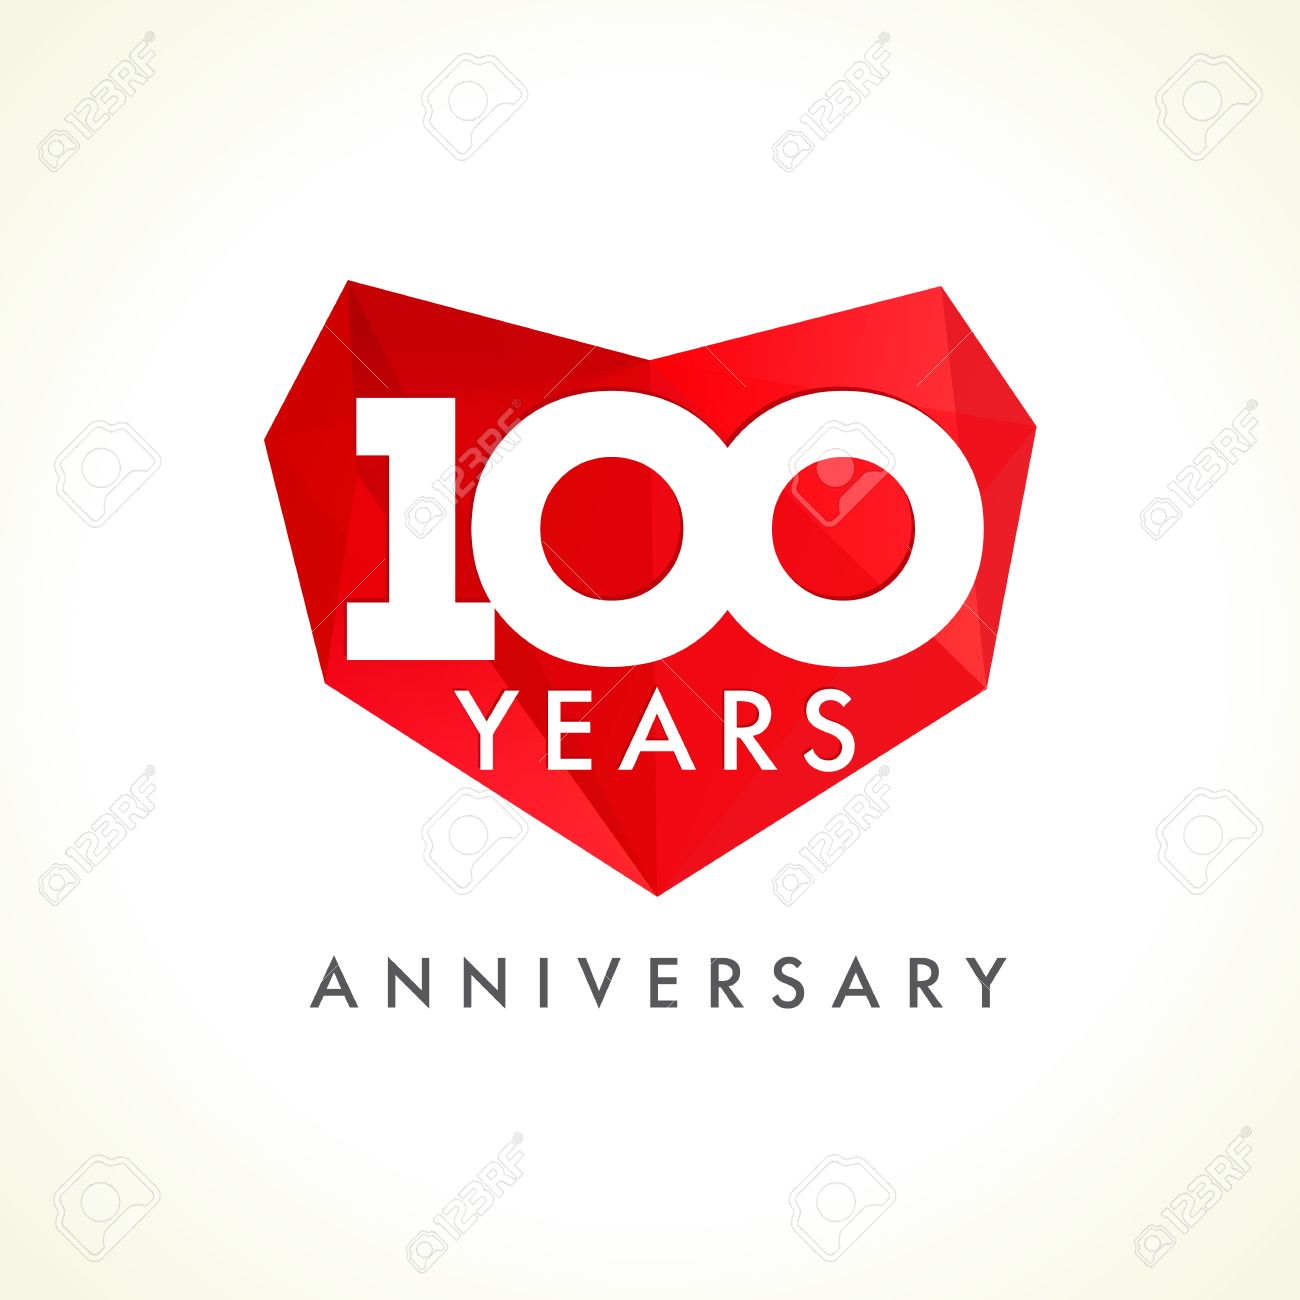 Anniversary 100 Years Old Hearts Celebrating Vector Logo Birthday